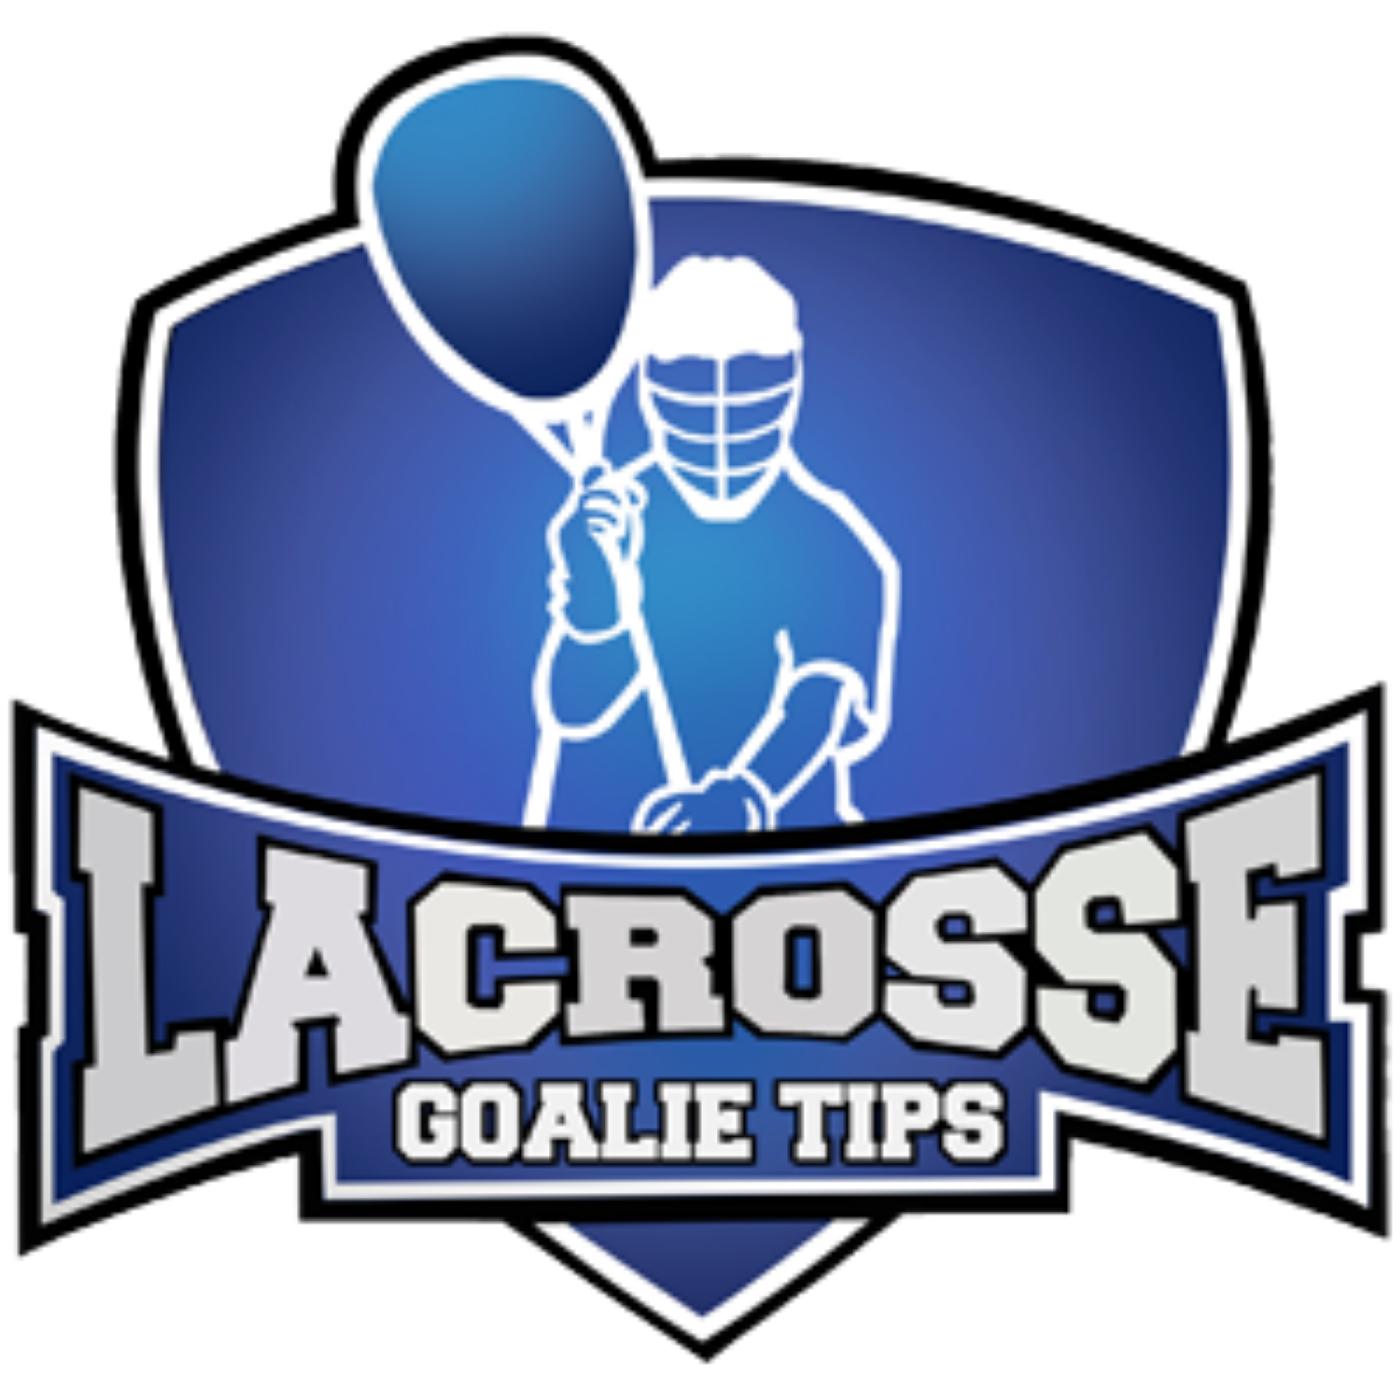 LacrosseGoalieTips.com Podcast show art